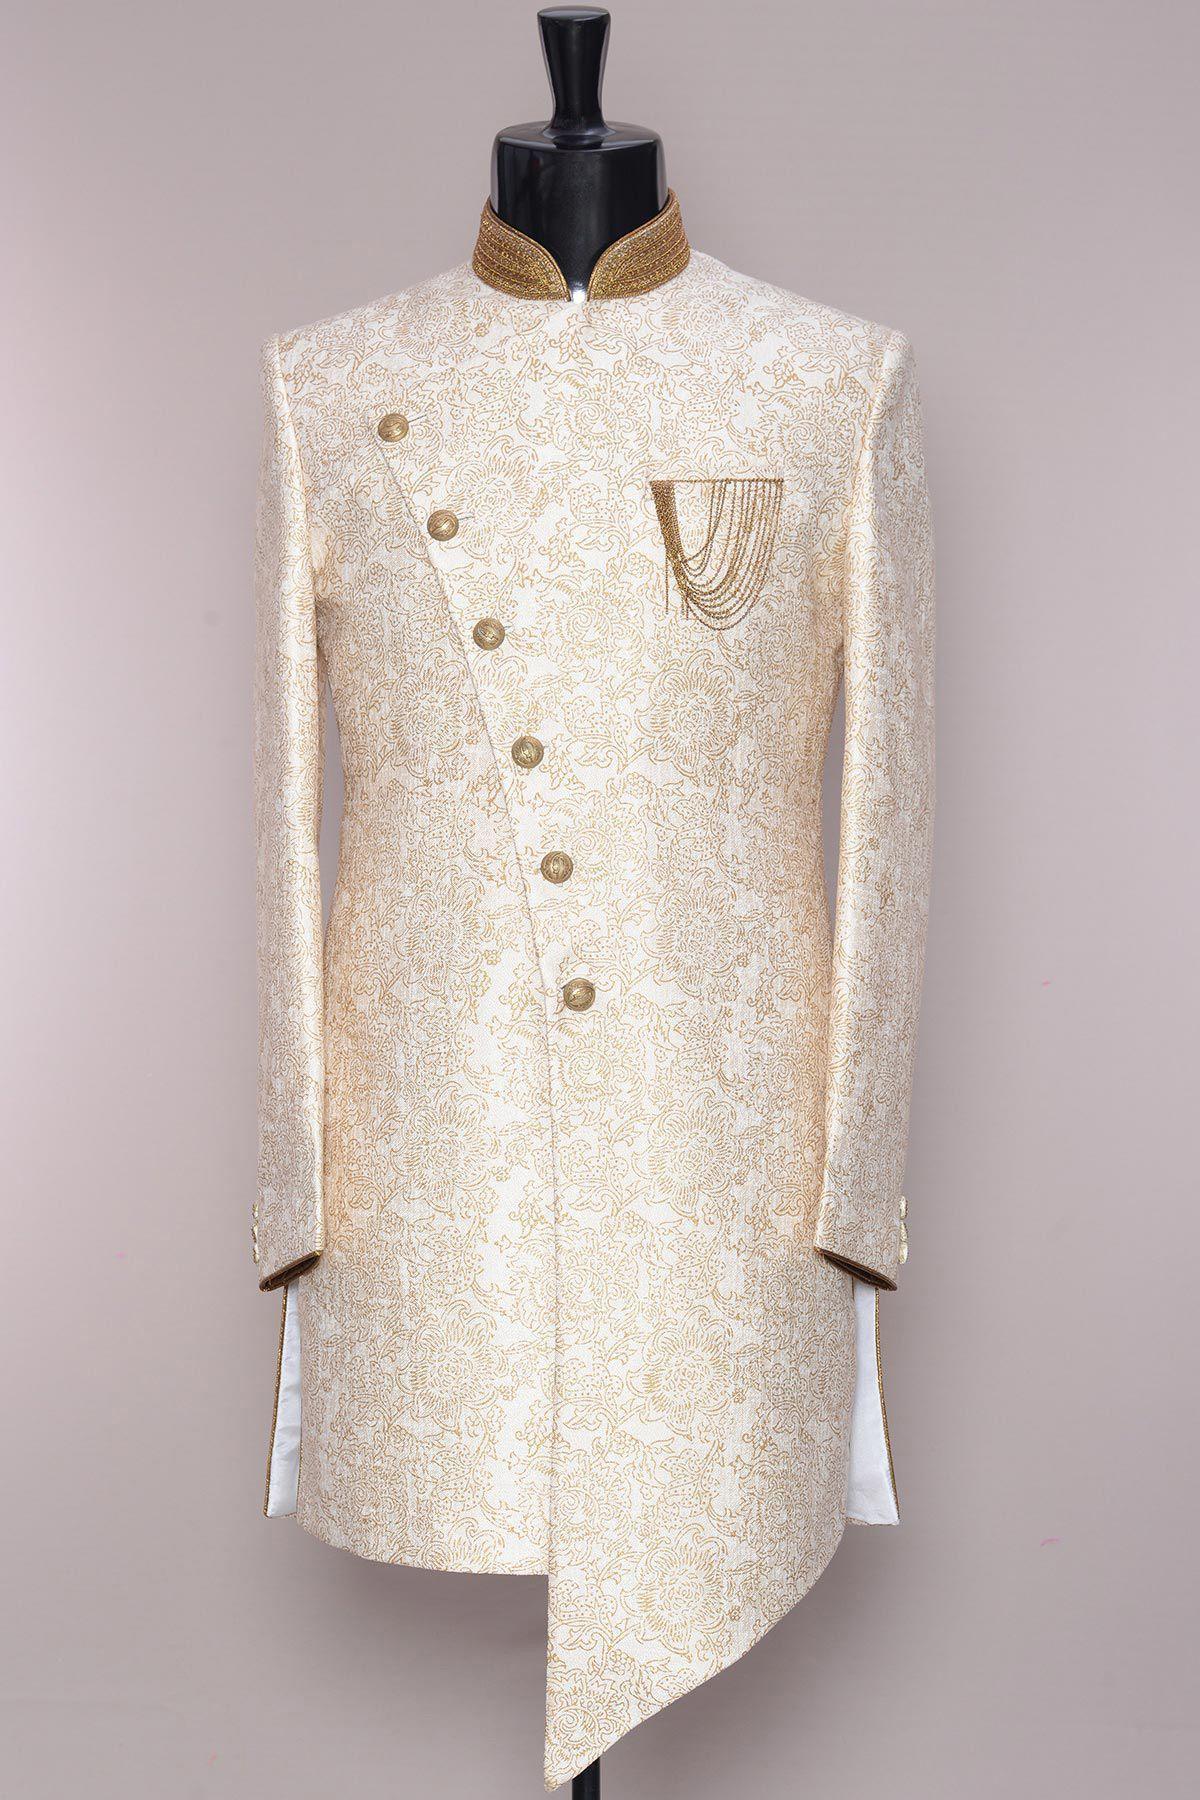 Honest New Mens White Achkan Fashion Sherwani Designer Stylish Coat Blazer Jackets Suits & Suit Separates